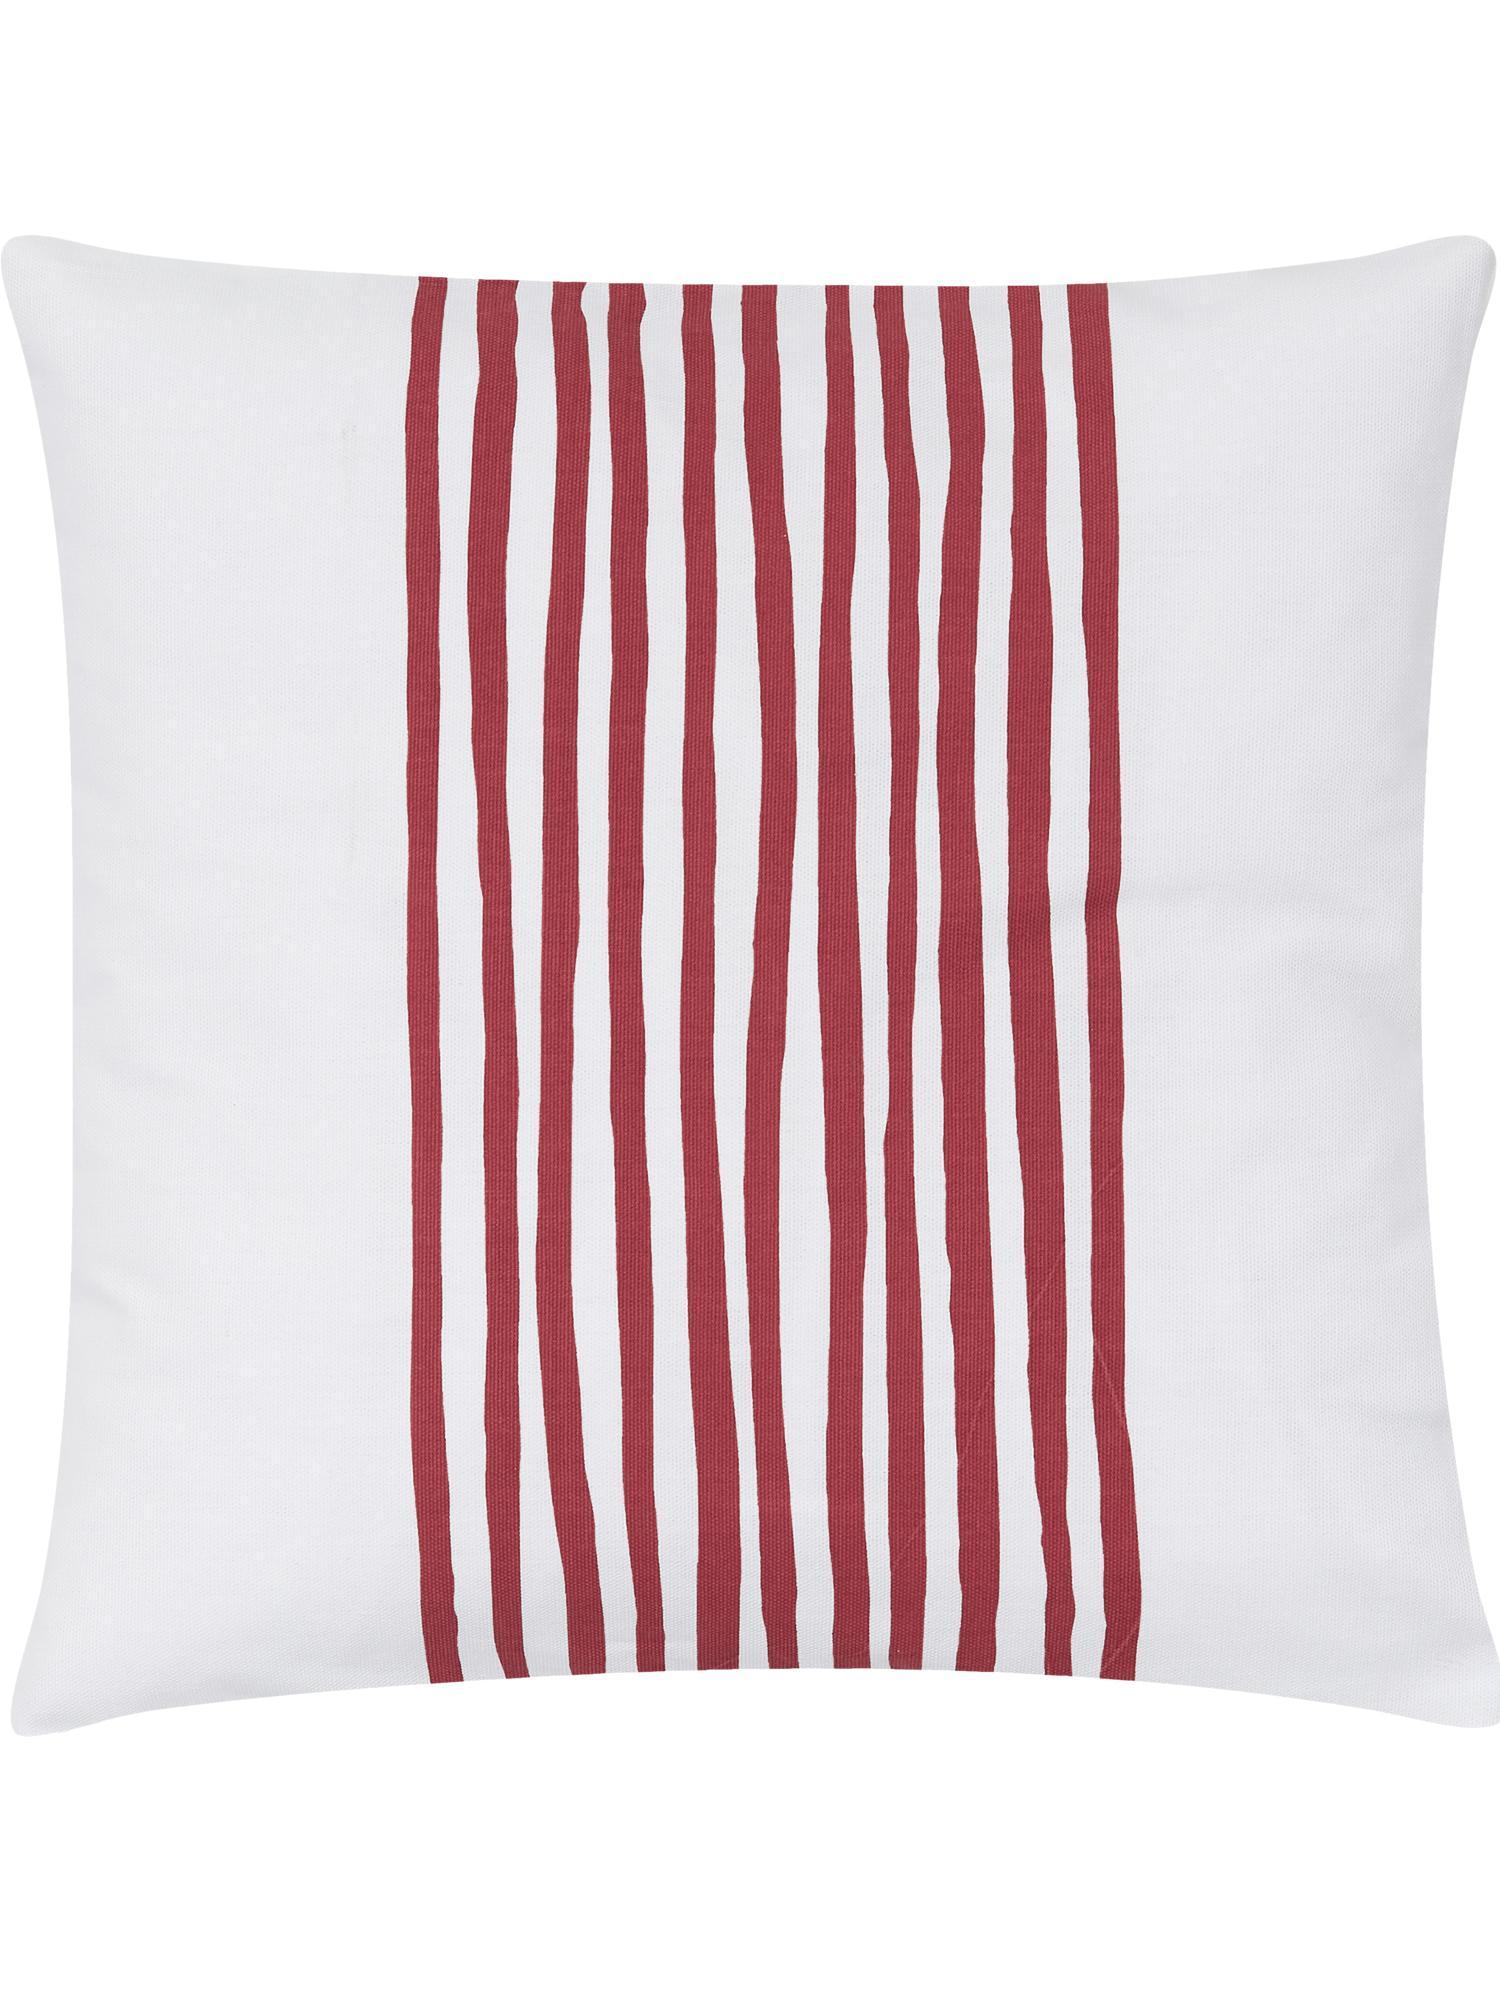 Funda de cojín Corey, 100% algodón, Blanco, rojo oscuro, An 40 x L 40 cm